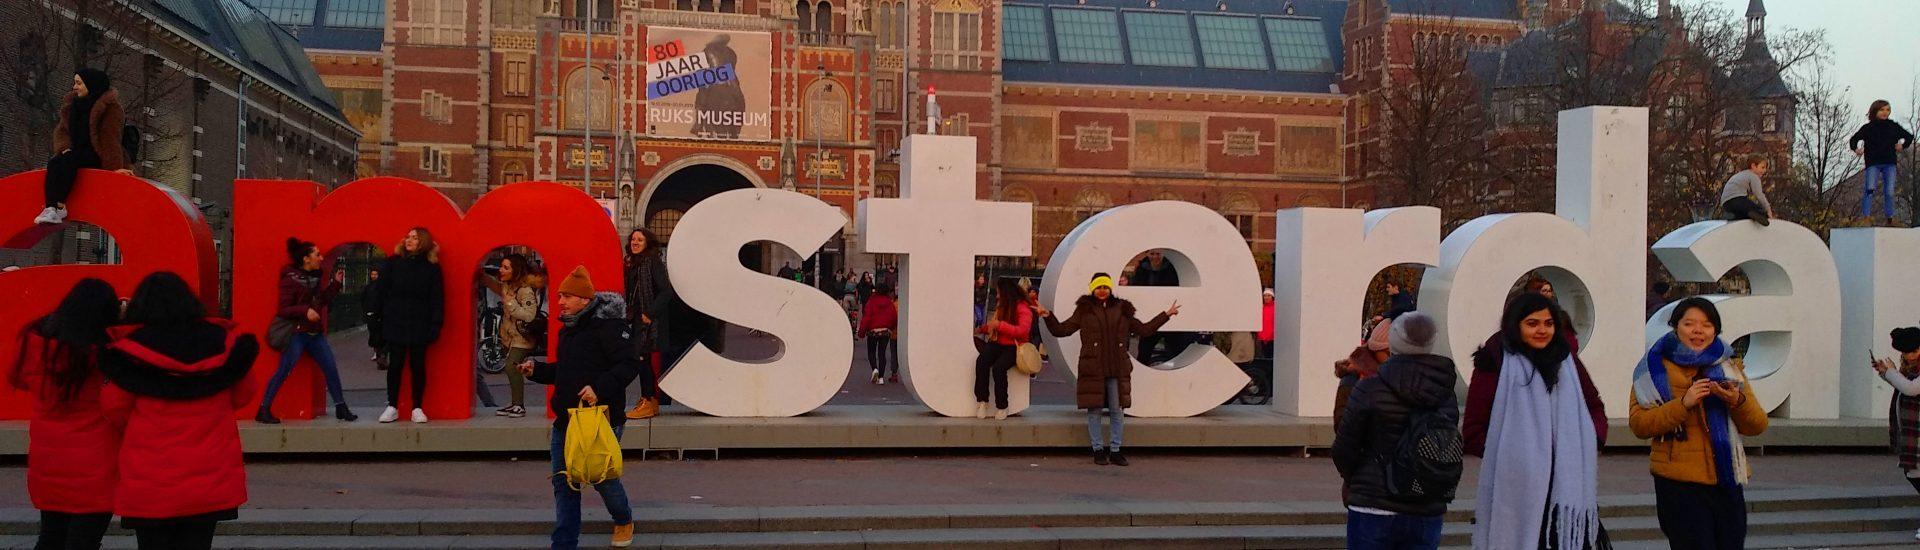 Amesterdam : Broader Perspective 1